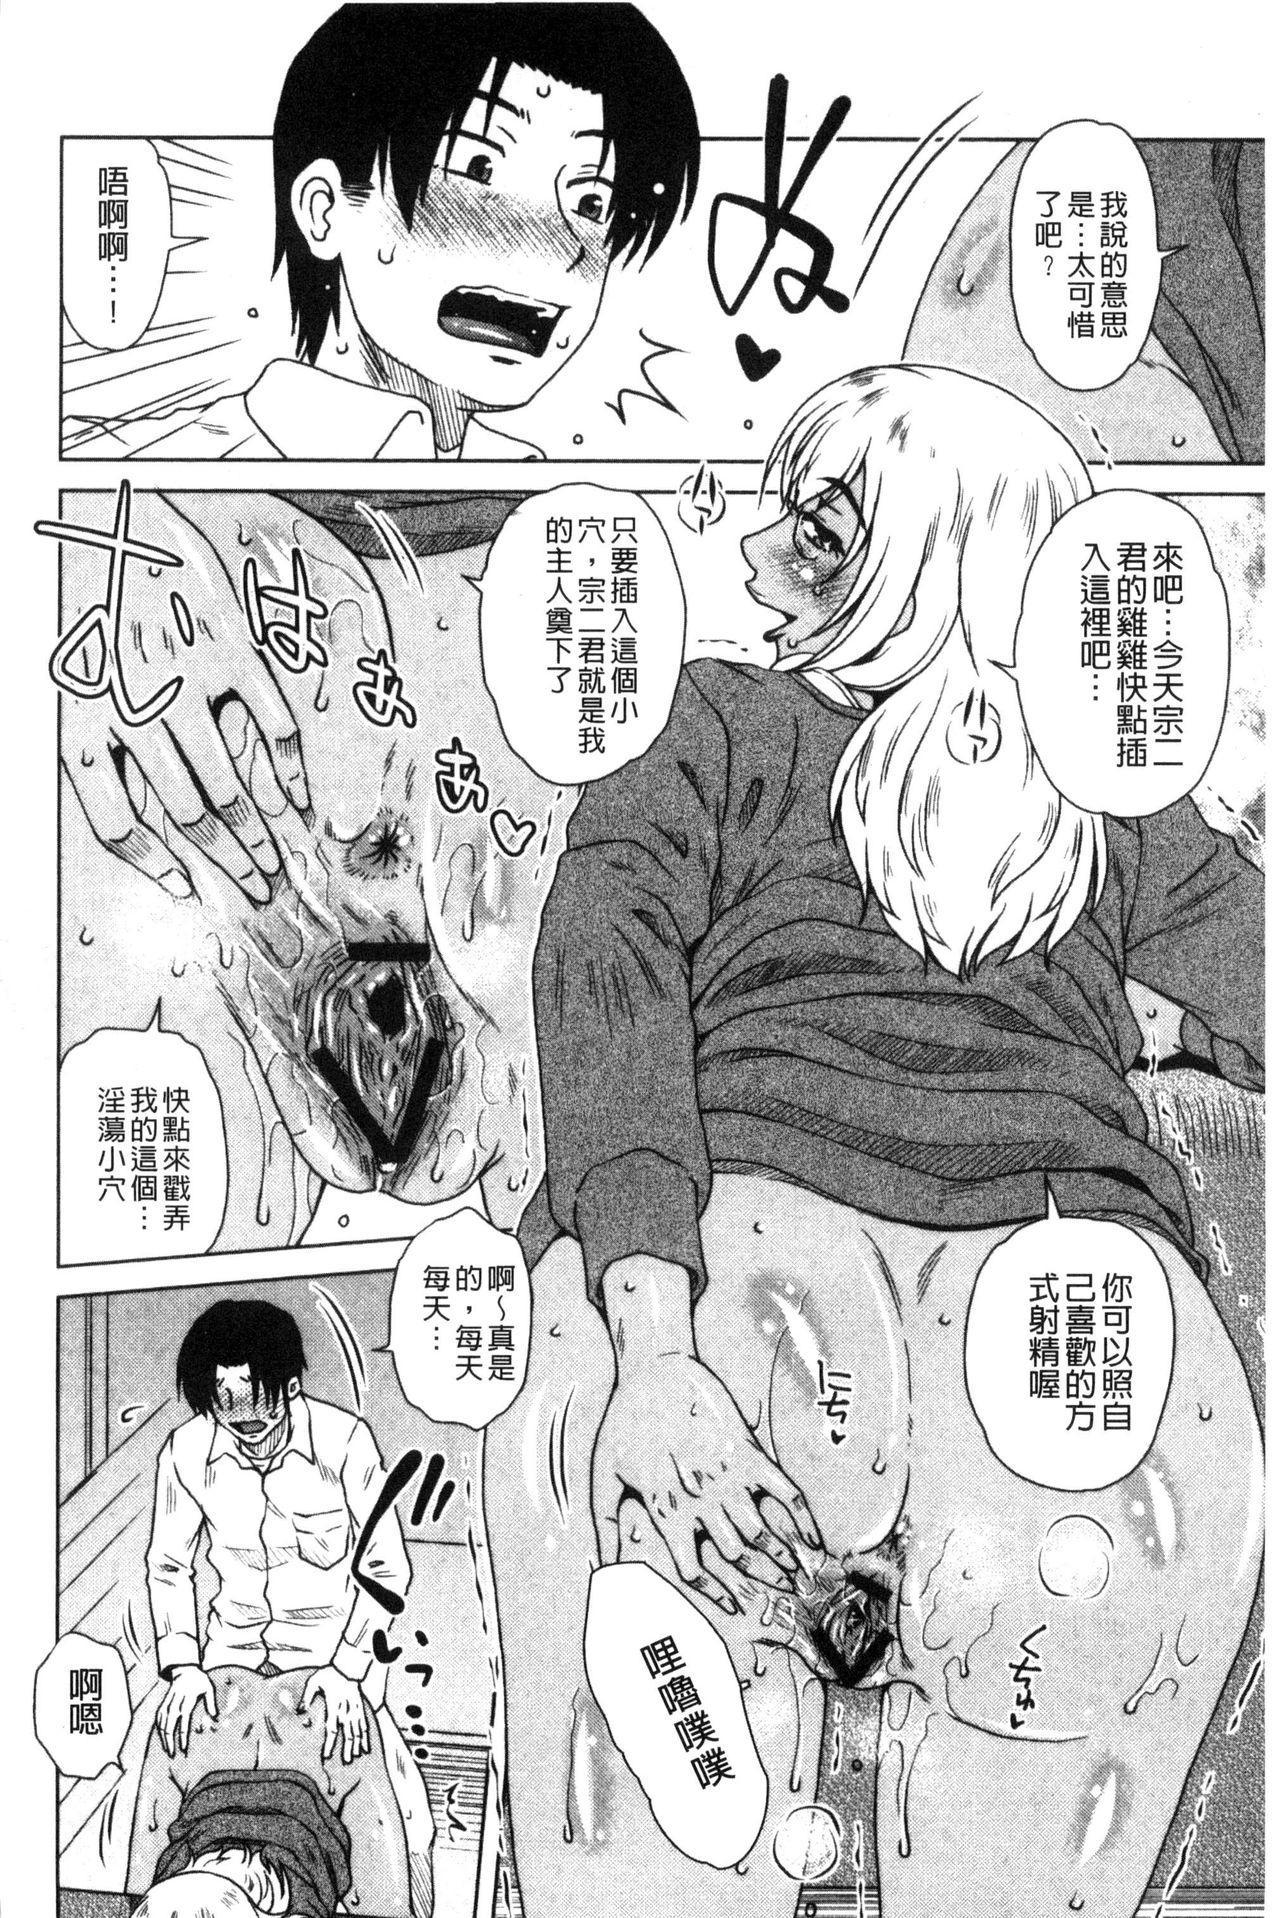 [Kurumiya Mashimin] Uchi no Shachou no Hamedere Inkatsu - Our President is HAME-DERE in Licentious sex life. [Chinese] 16